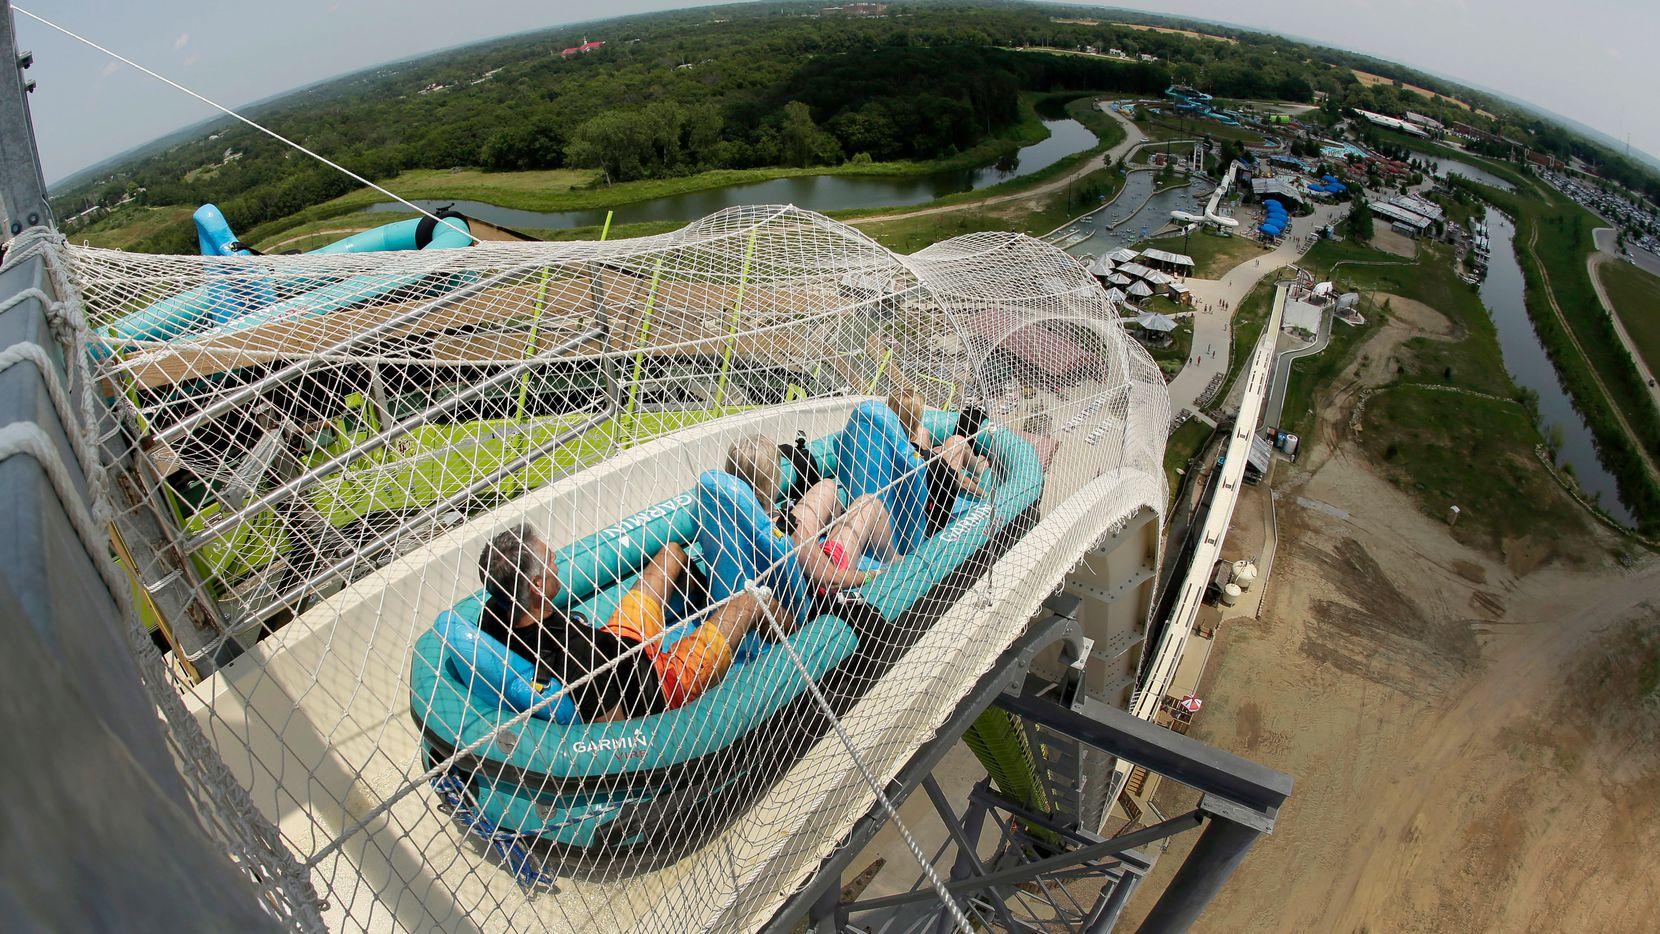 Riders go down the Verruckt water slide at Schlitterbahn in Kansas City, Kan.